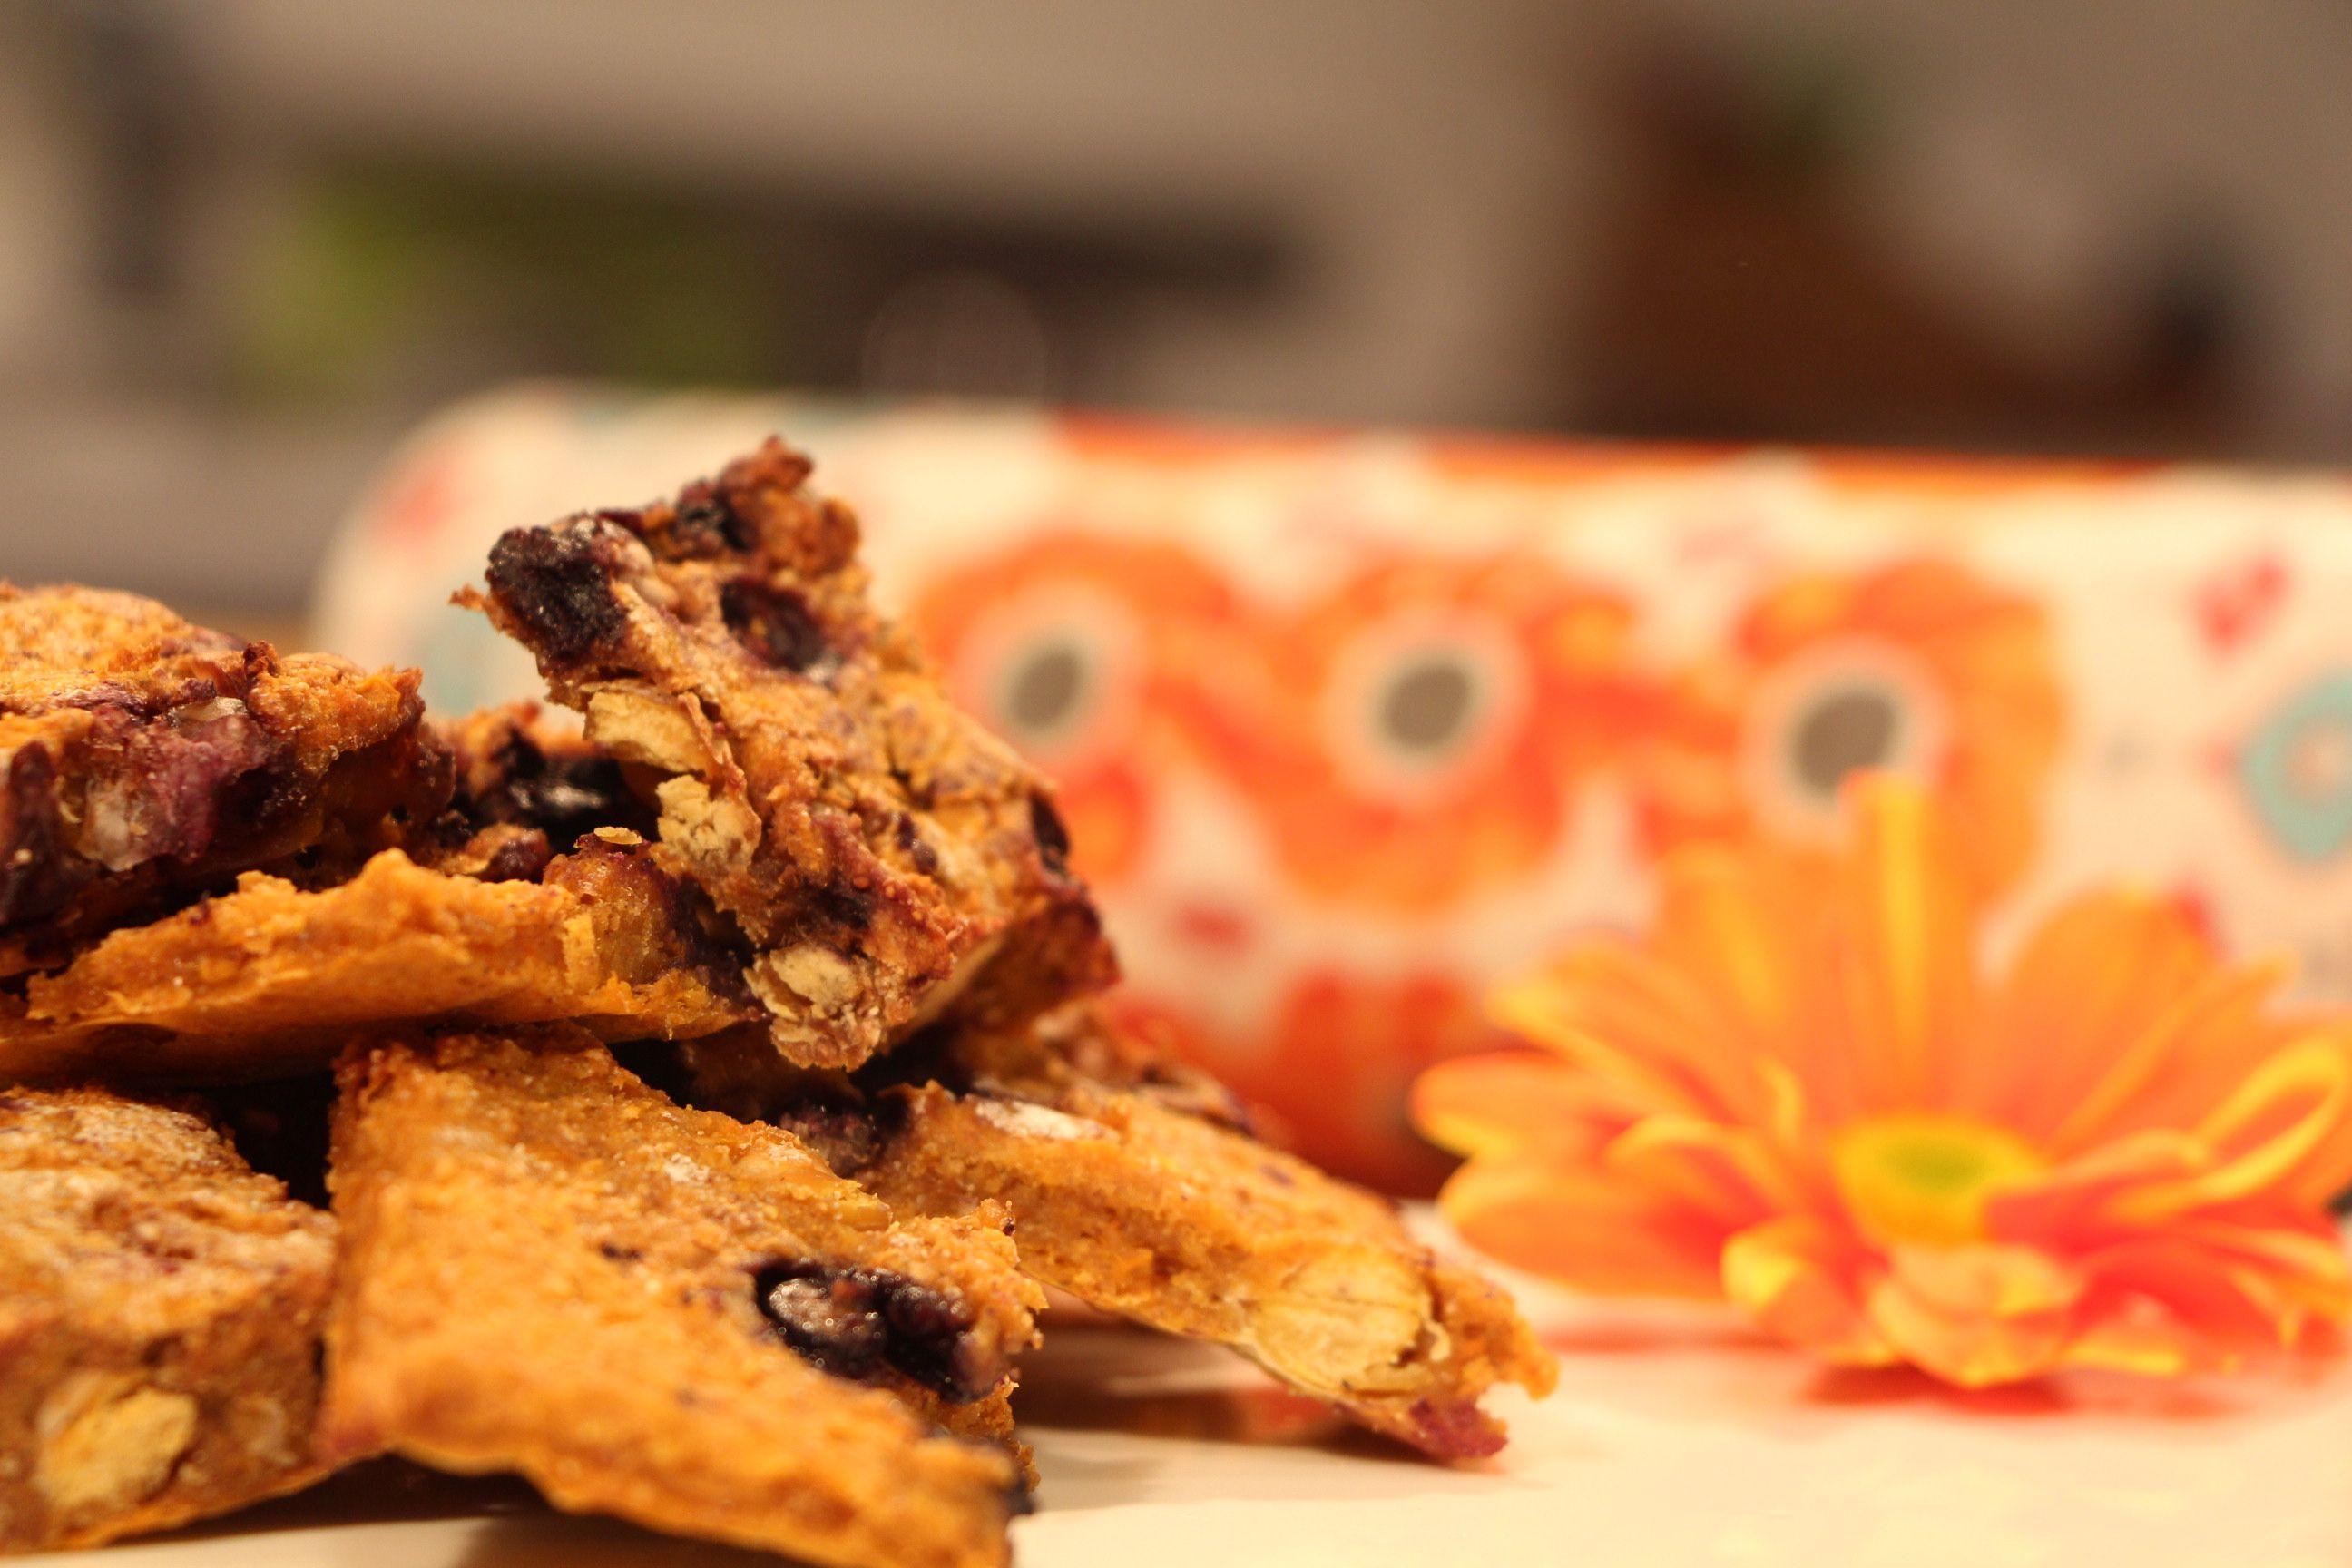 Esthers protein treats vegan snacks snacks low cal snacks